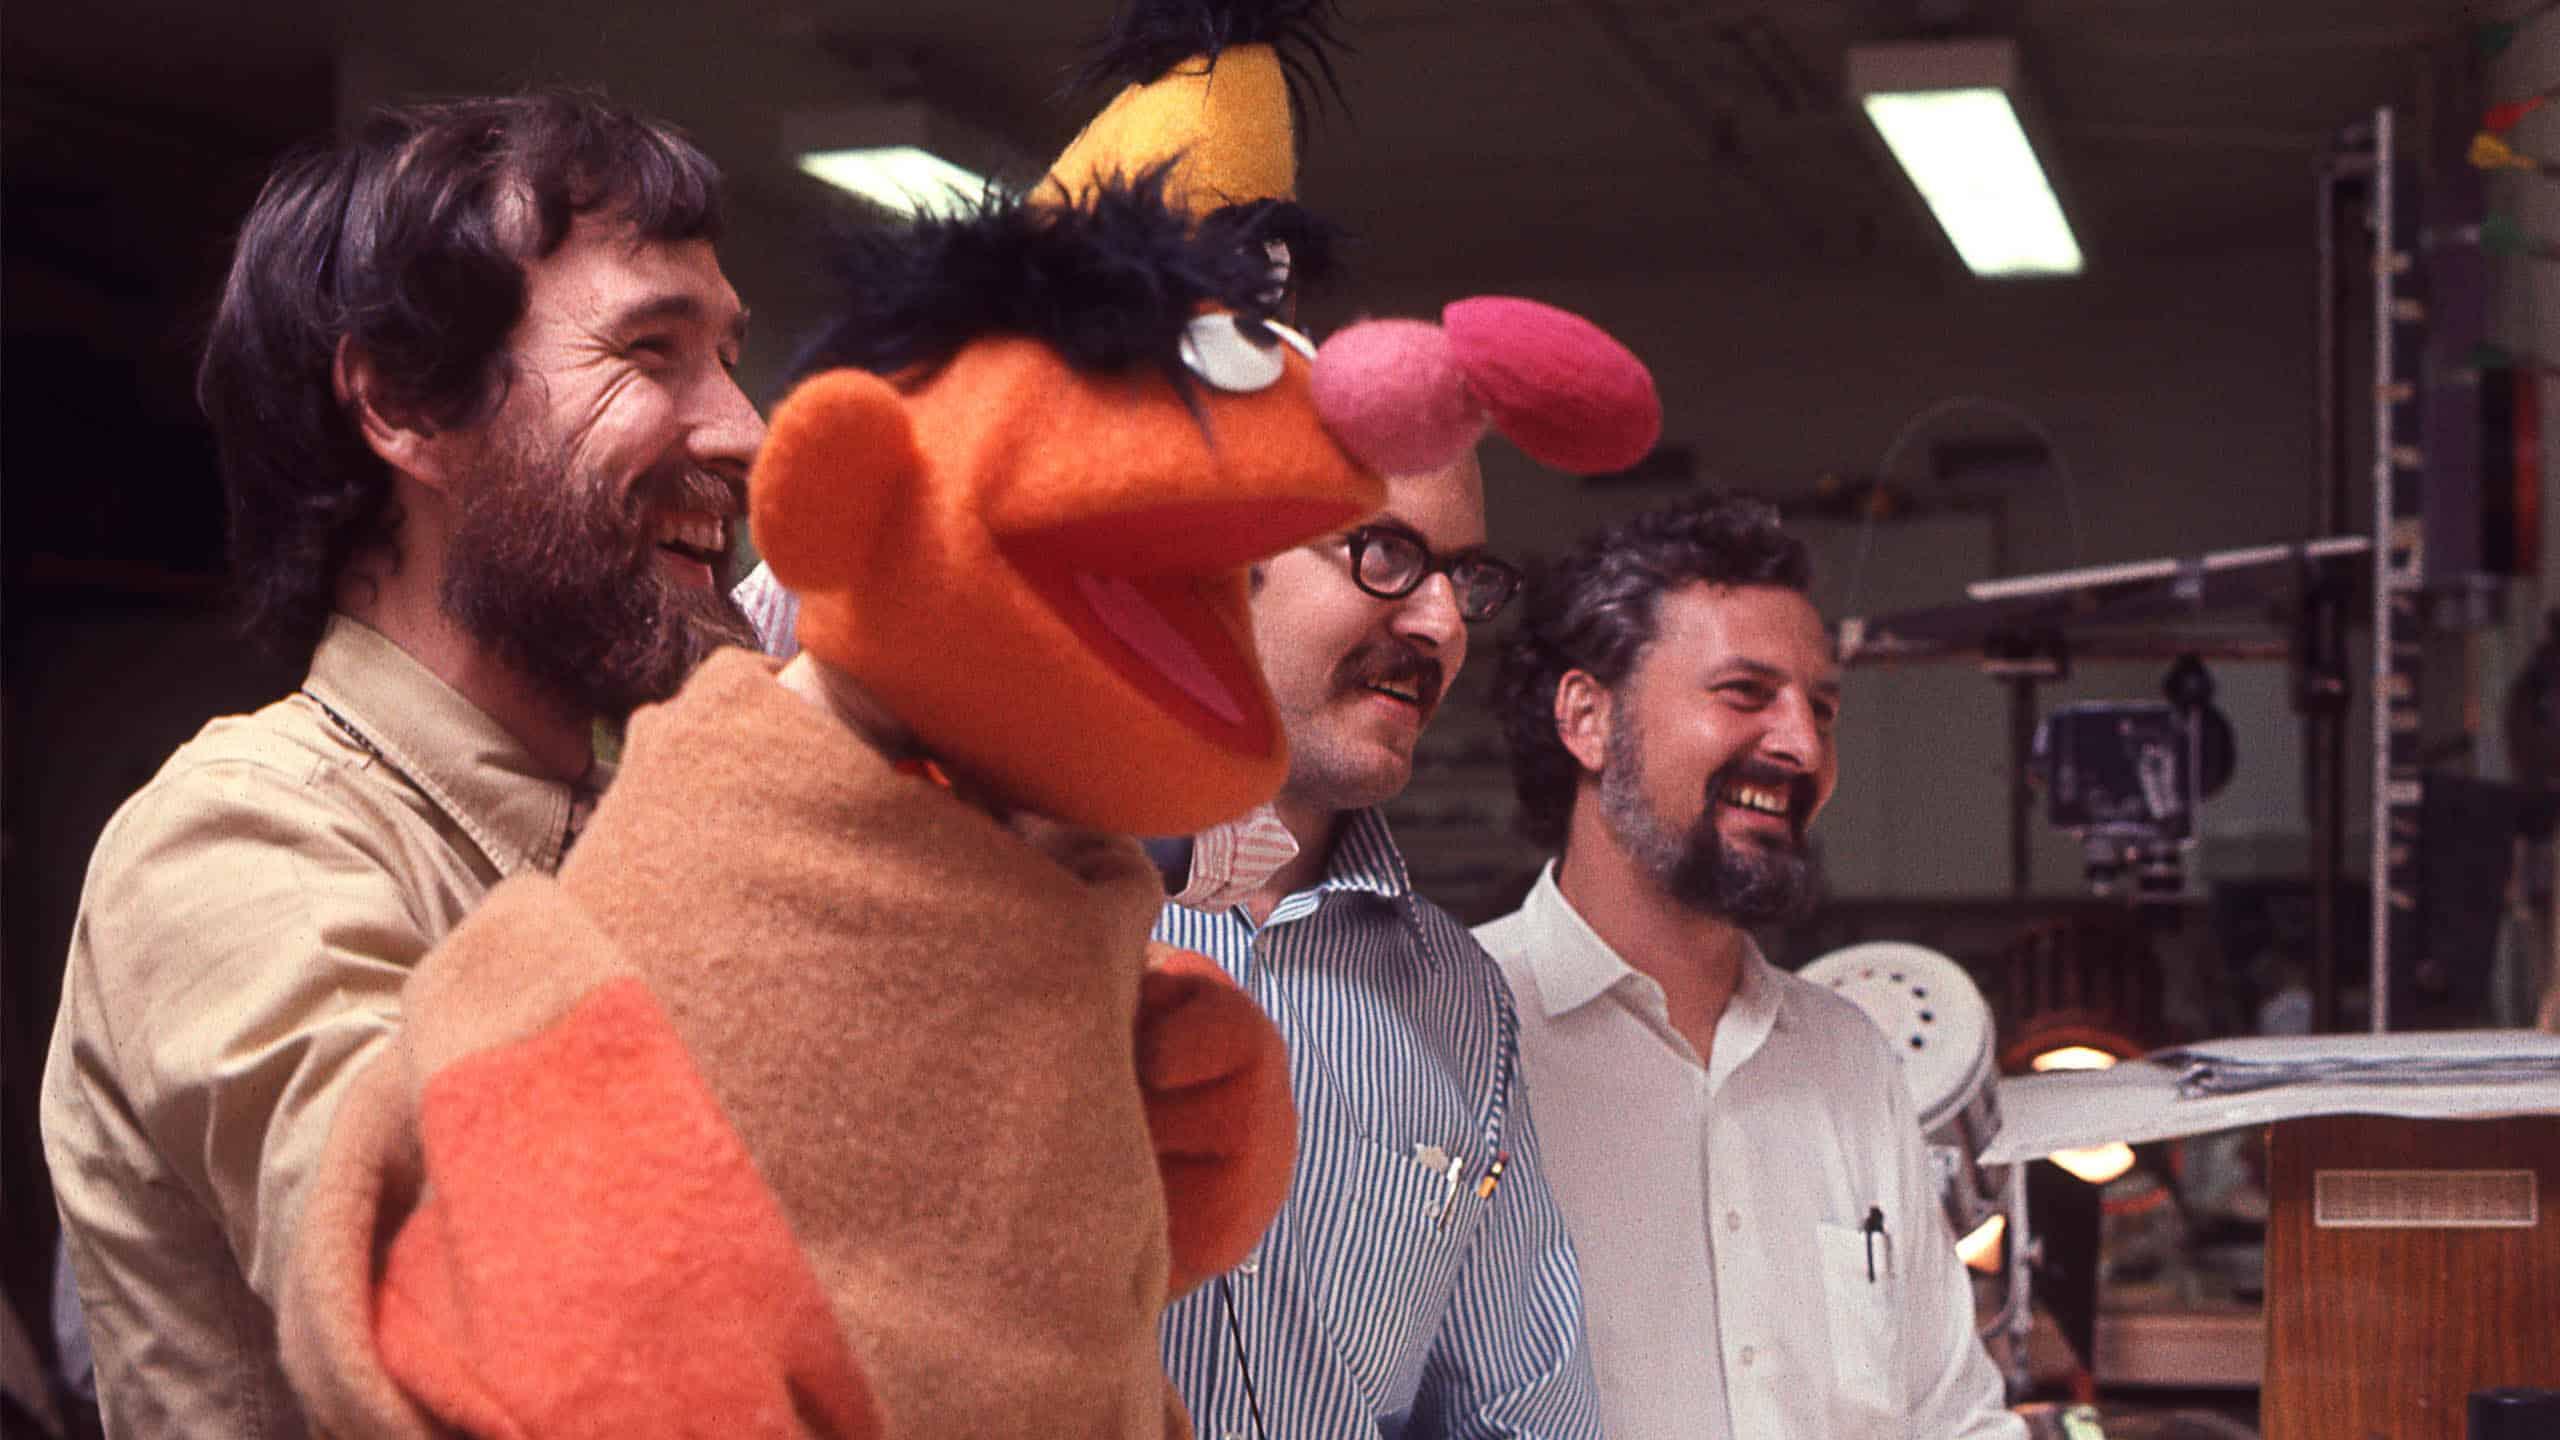 Jim Henson and Frank Oz portraying Ernie and Burt